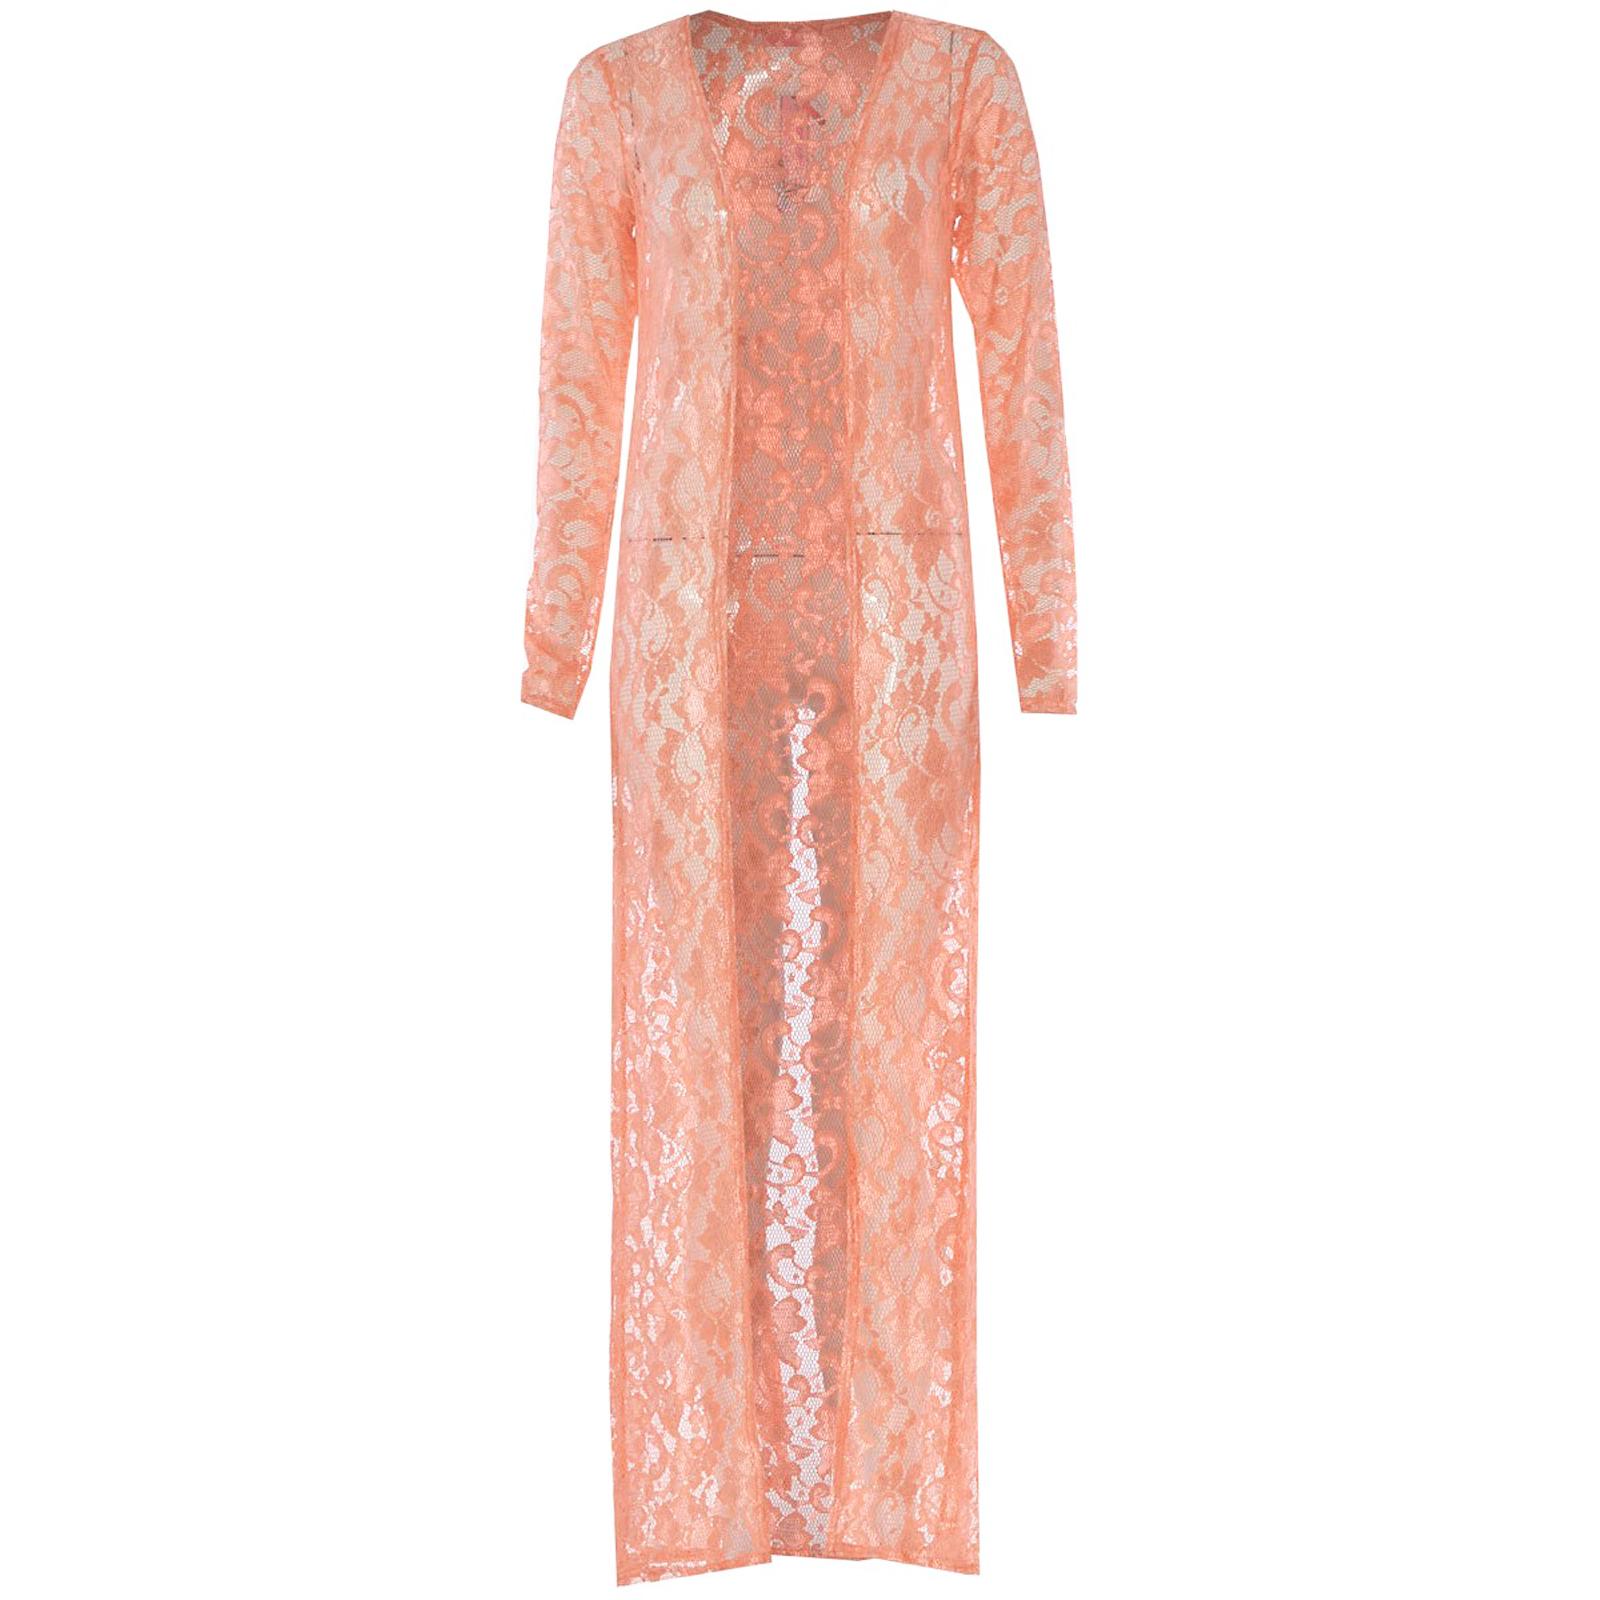 New Women Long Lace Open Cardigan Celeb Kimono Cardi Full Maxi Shrug Top  Ebay-6684